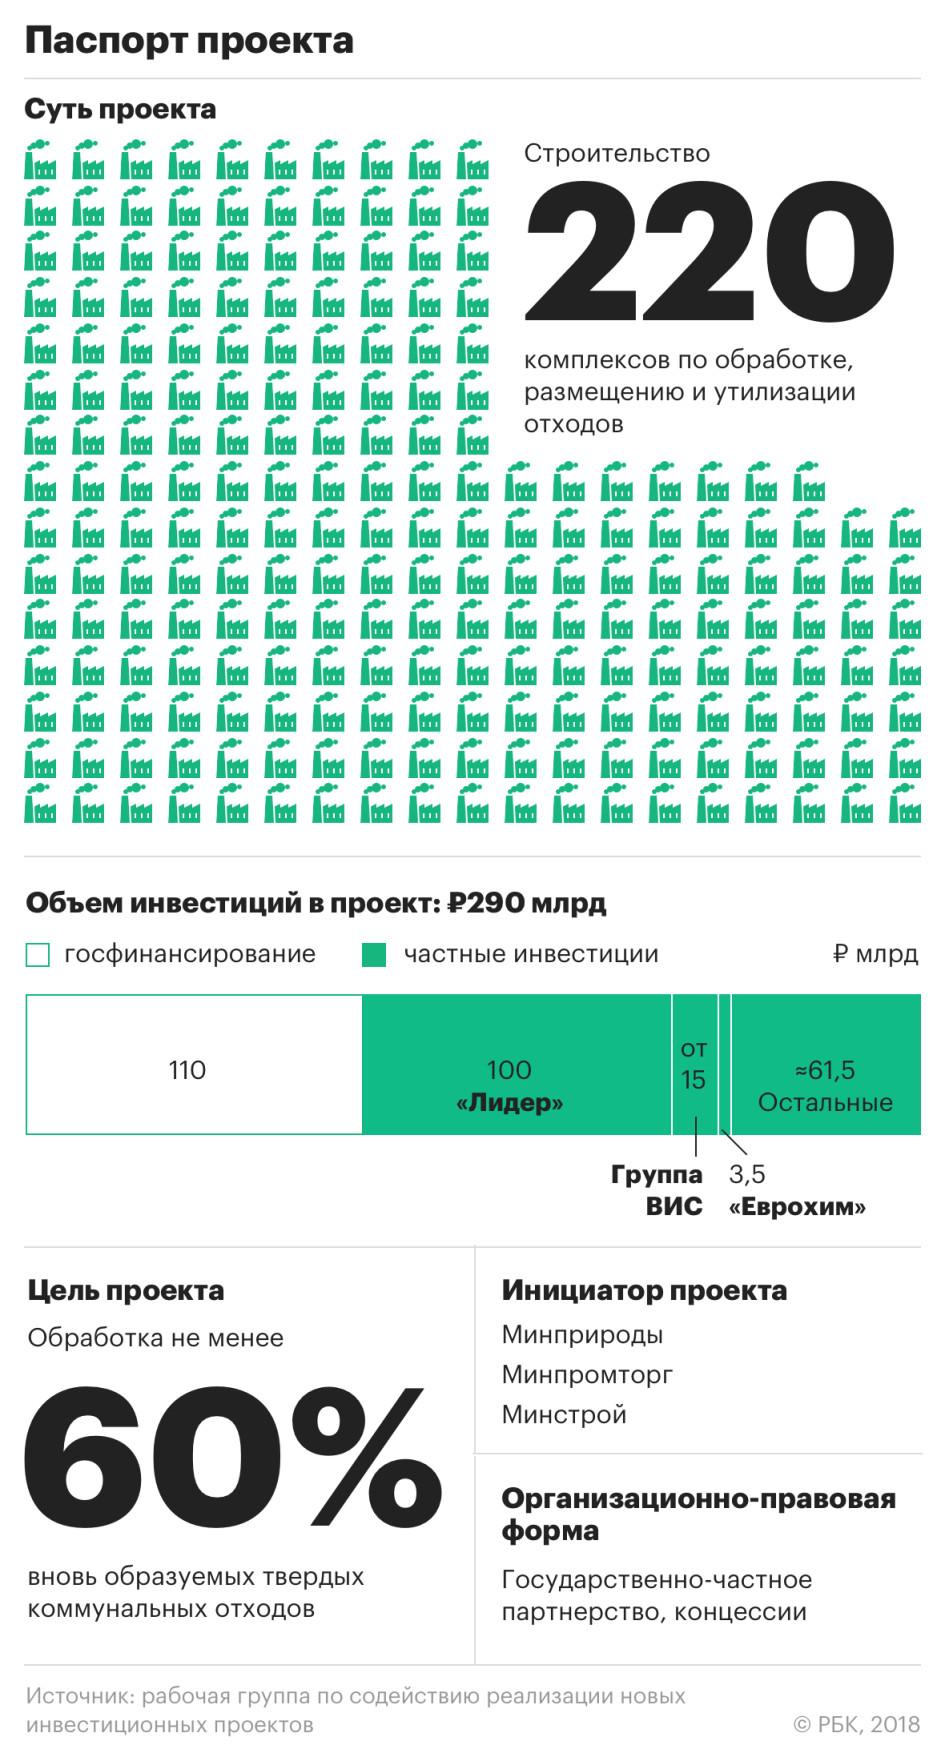 https://s0.rbk.ru/v6_top_pics/resized/945xH/media/img/1/12/755435099120121.jpeg